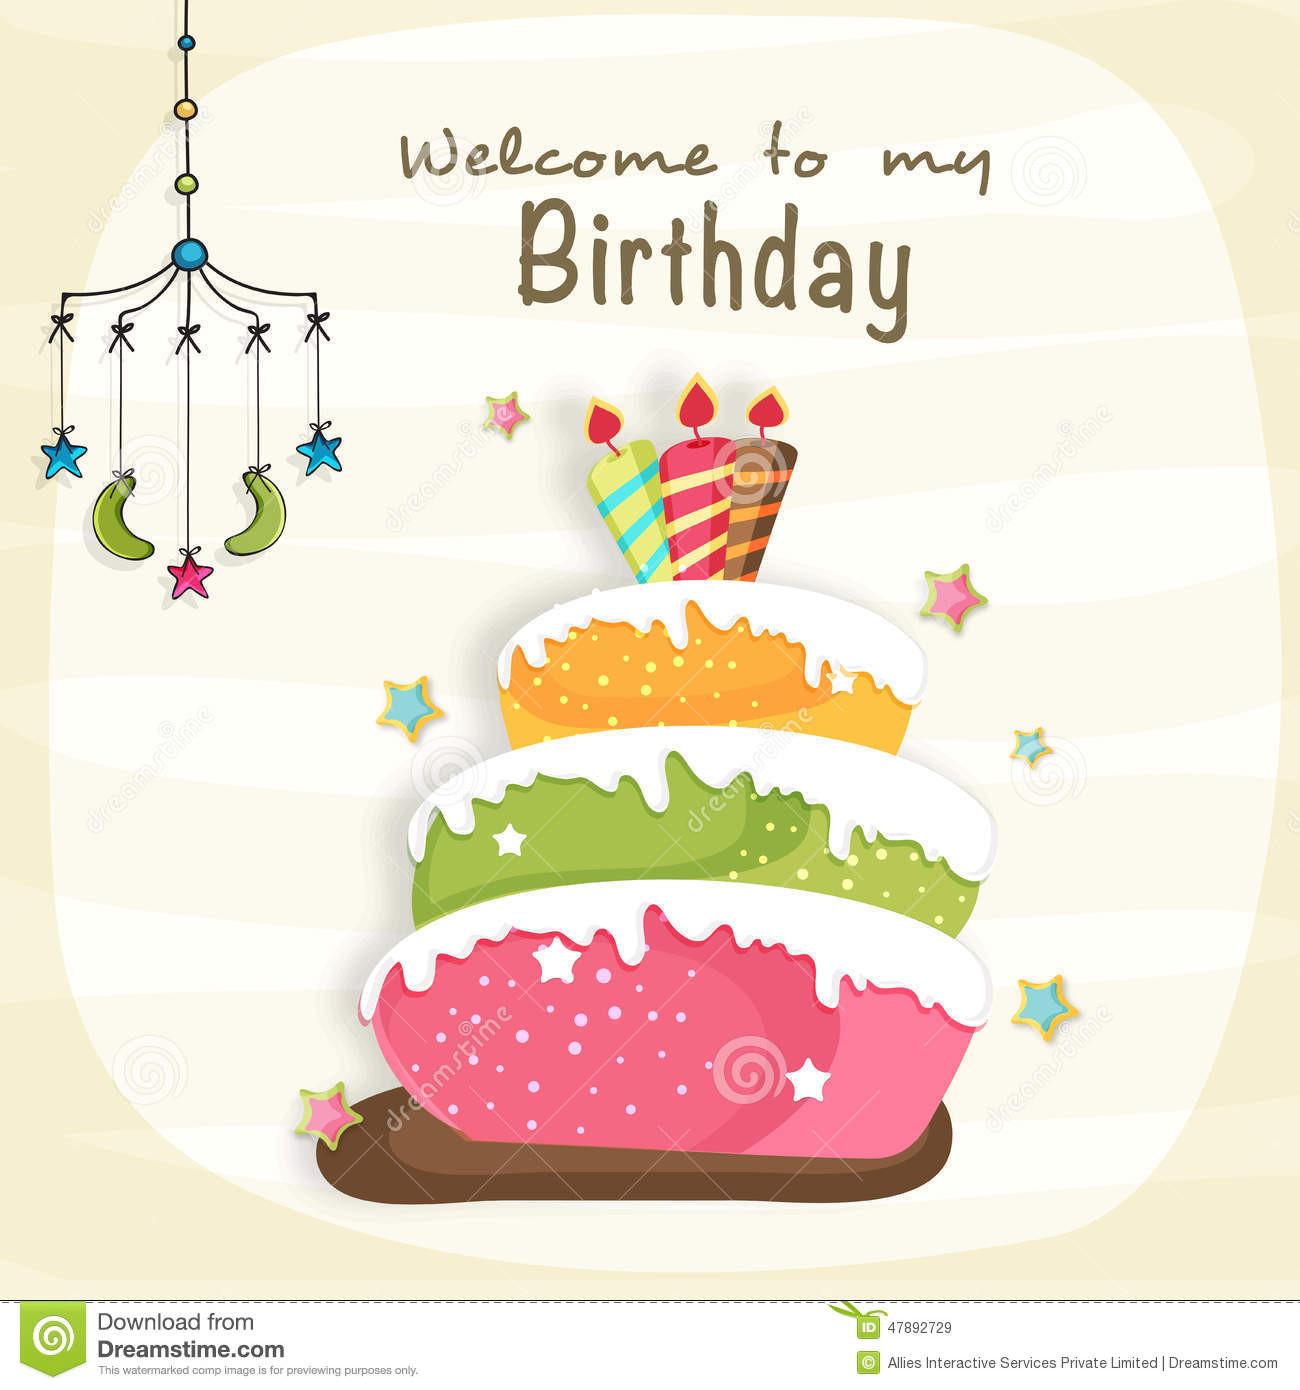 Best ideas about Design Birthday Invitations . Save or Pin Designing Birthday Invitations Now.